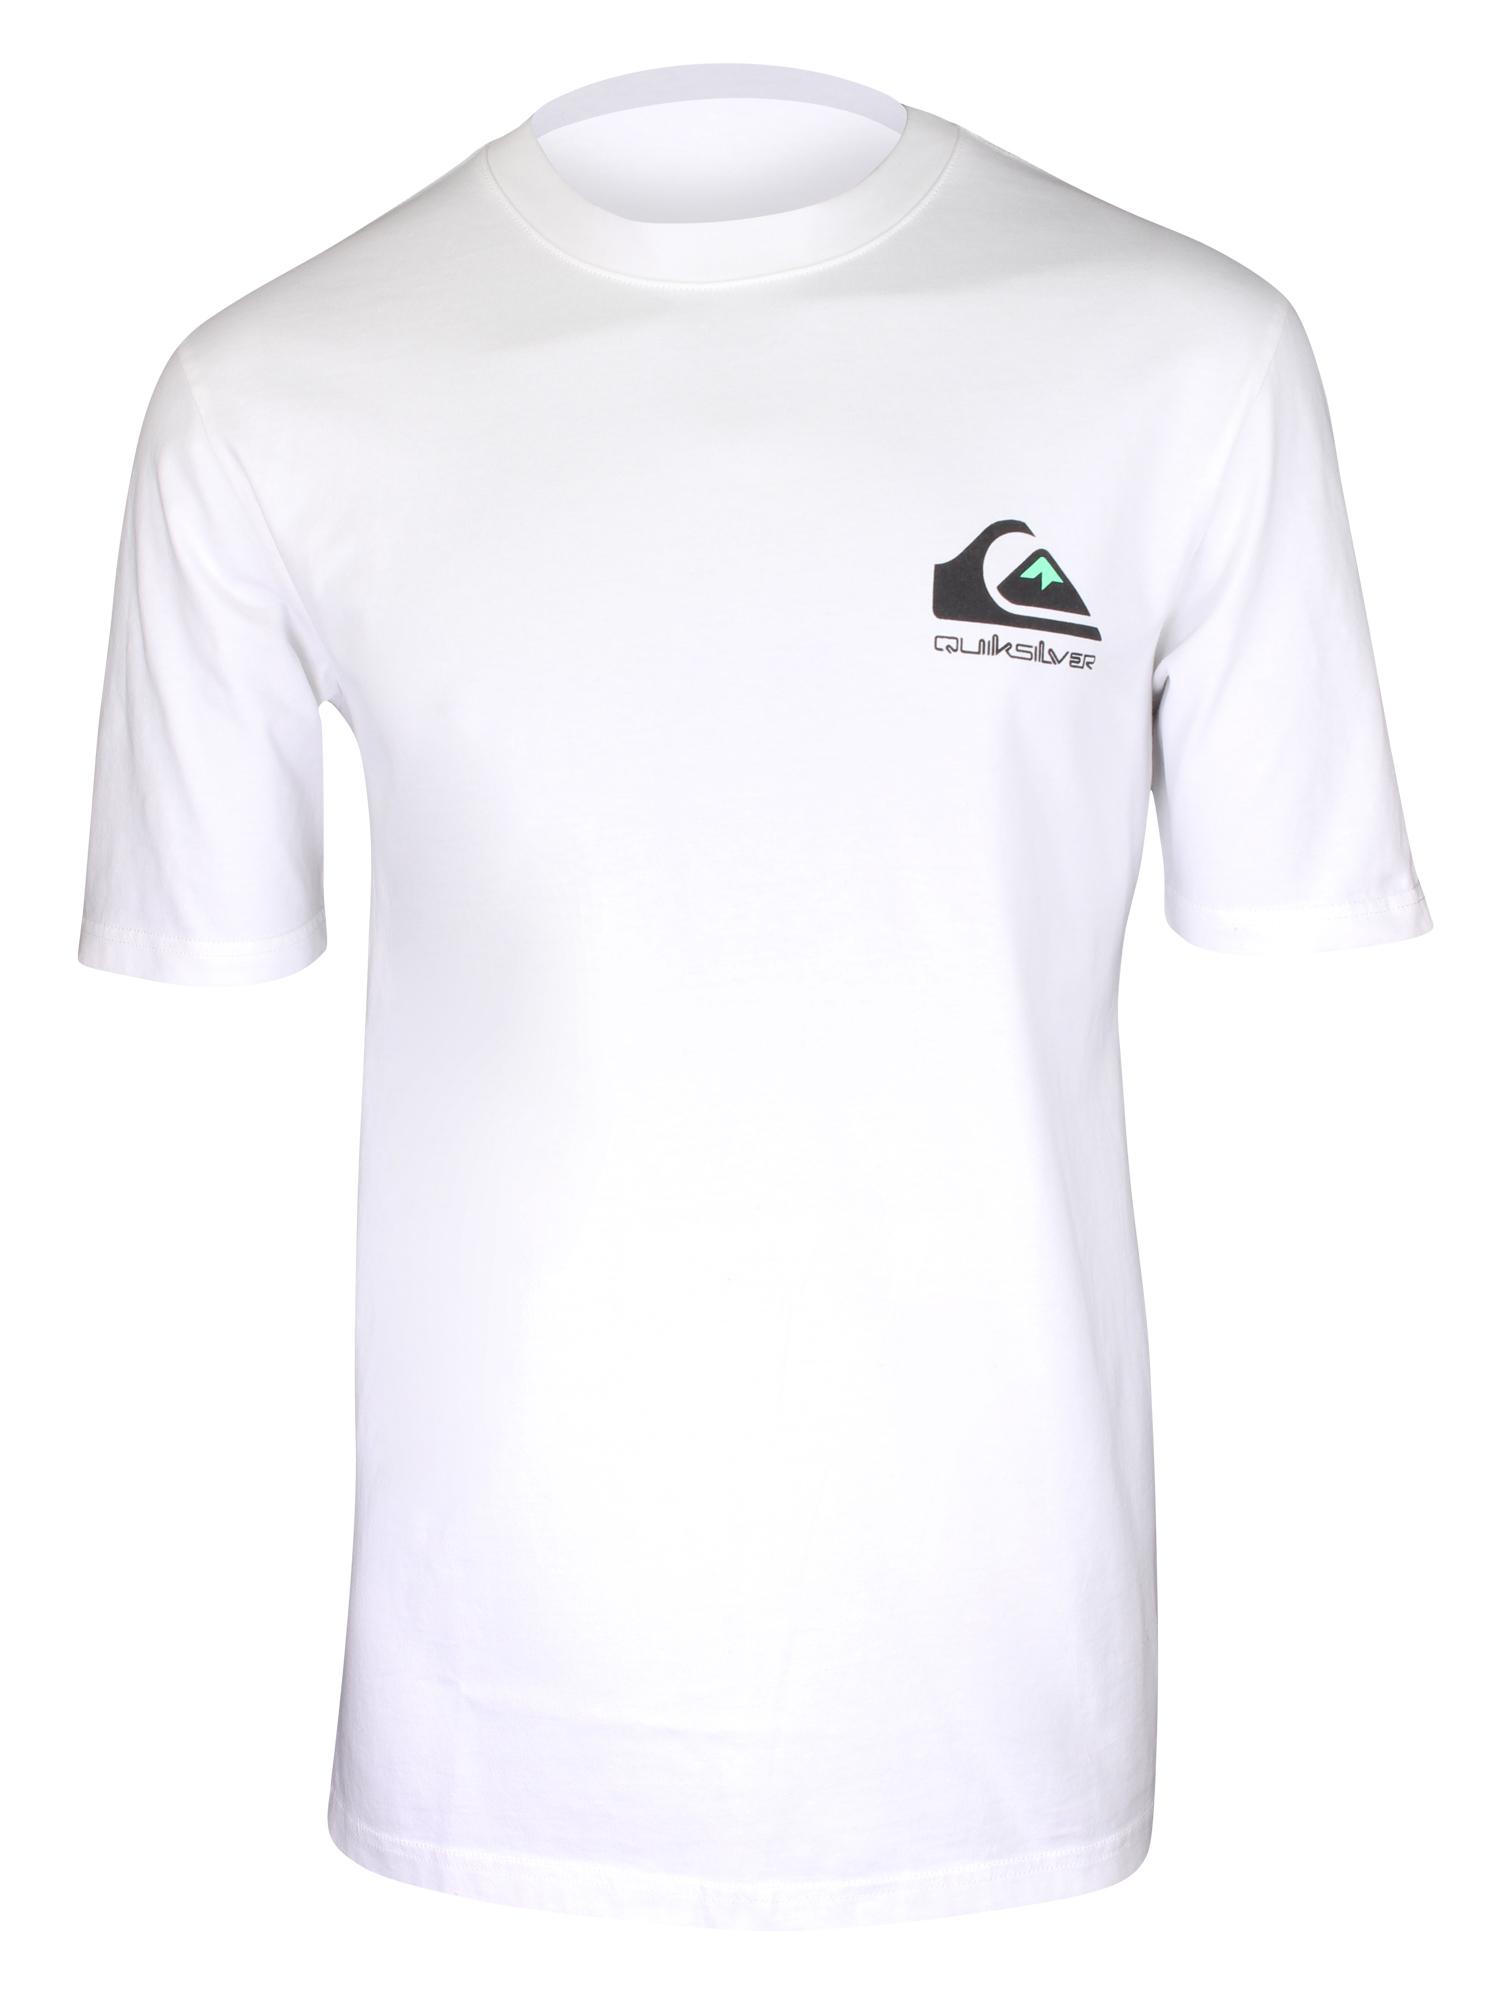 Quiksilver Mens Omni Original T-Shirt White